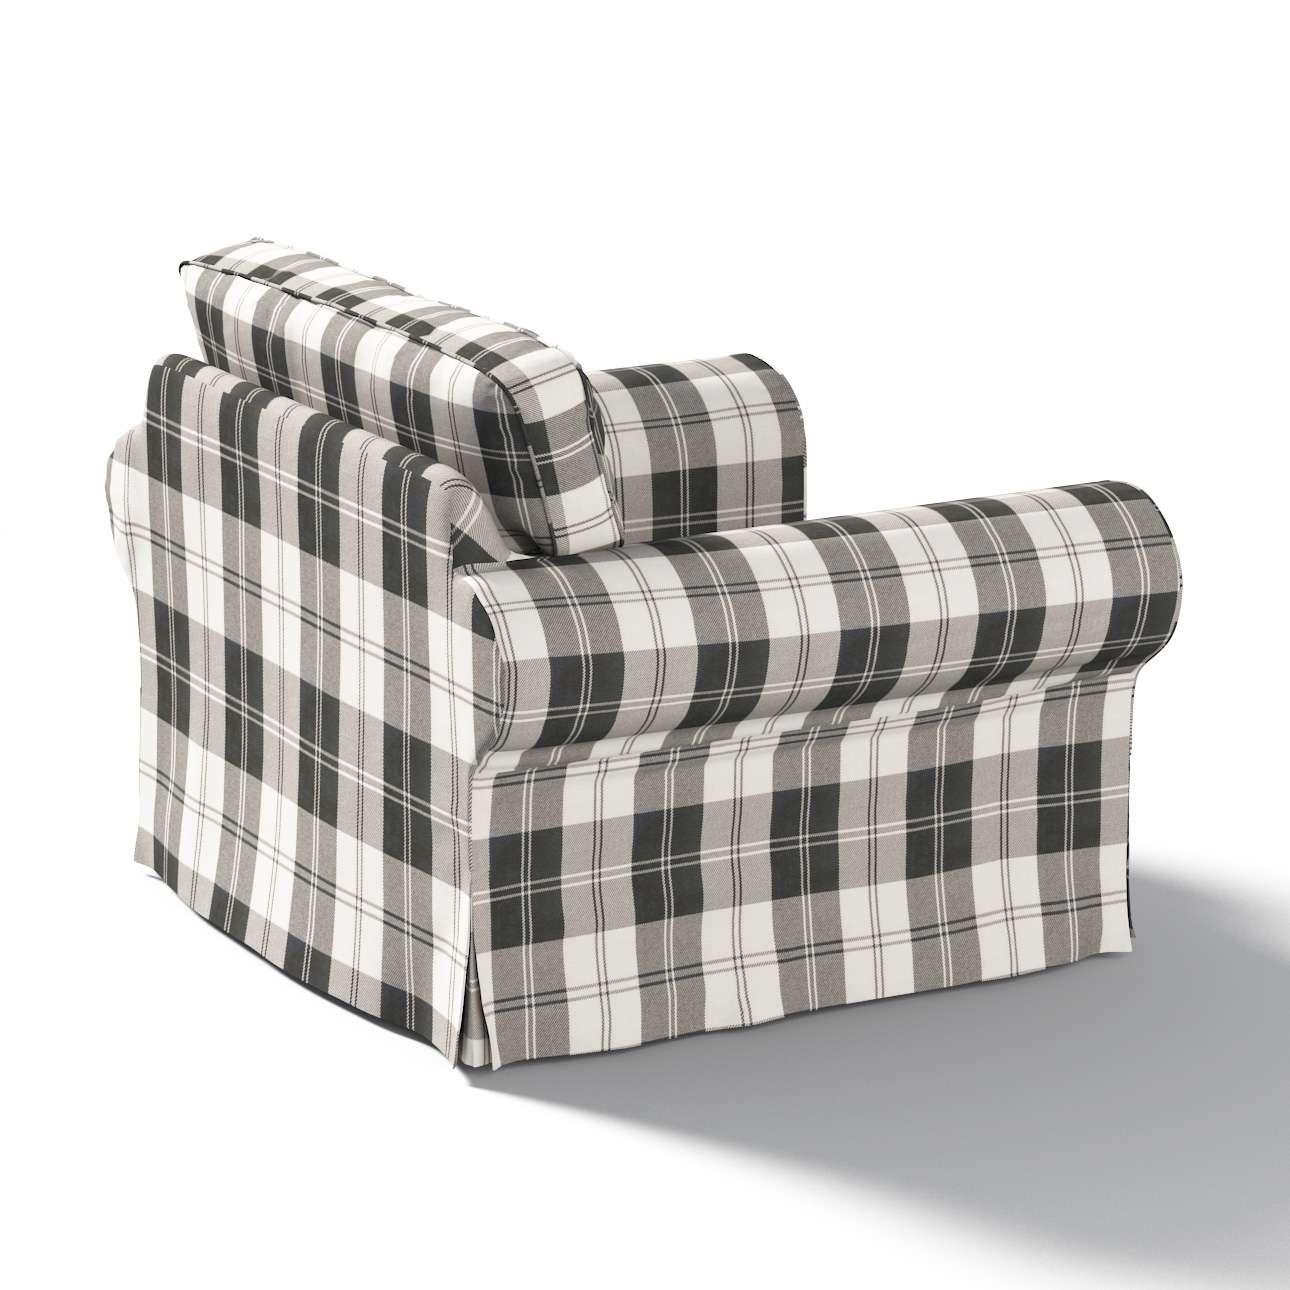 Ektorp Sesselbezug Sesselhusse, Ektorp Sessel von der Kollektion Edinburgh , Stoff: 115-74